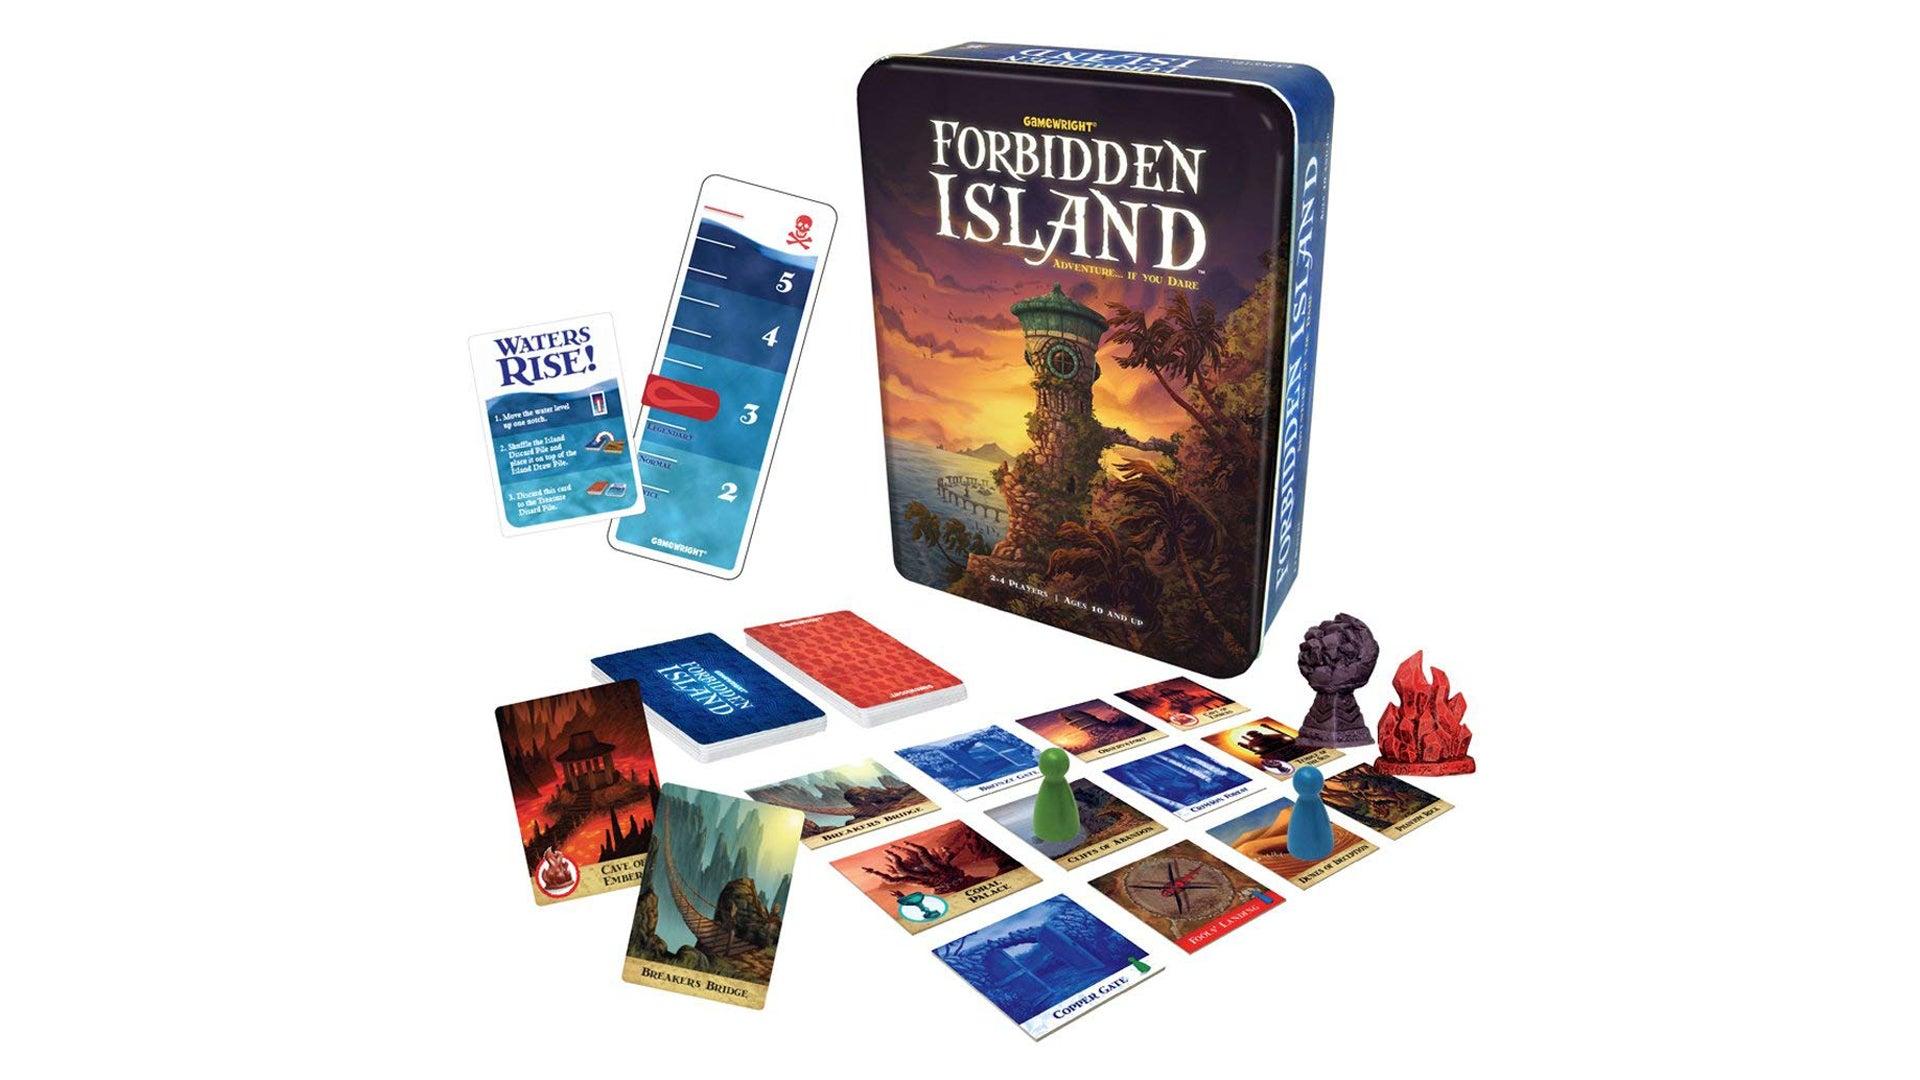 Forbidden Island board game layout